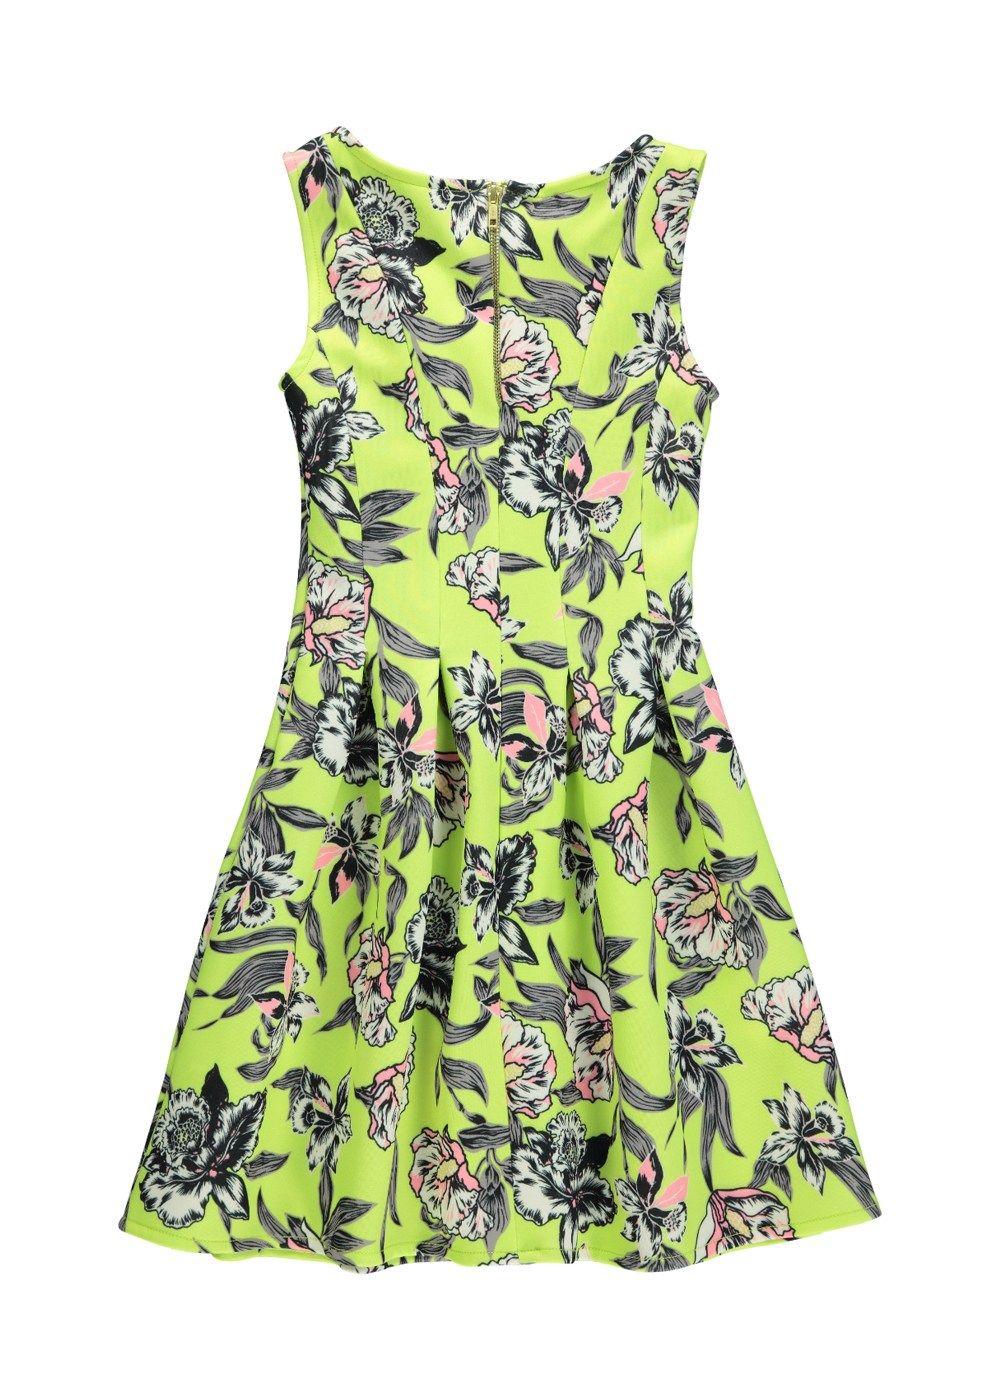 Girls Candy Couture Floral Neon Scuba Dress (8-16yrs) - Matalan | D ...